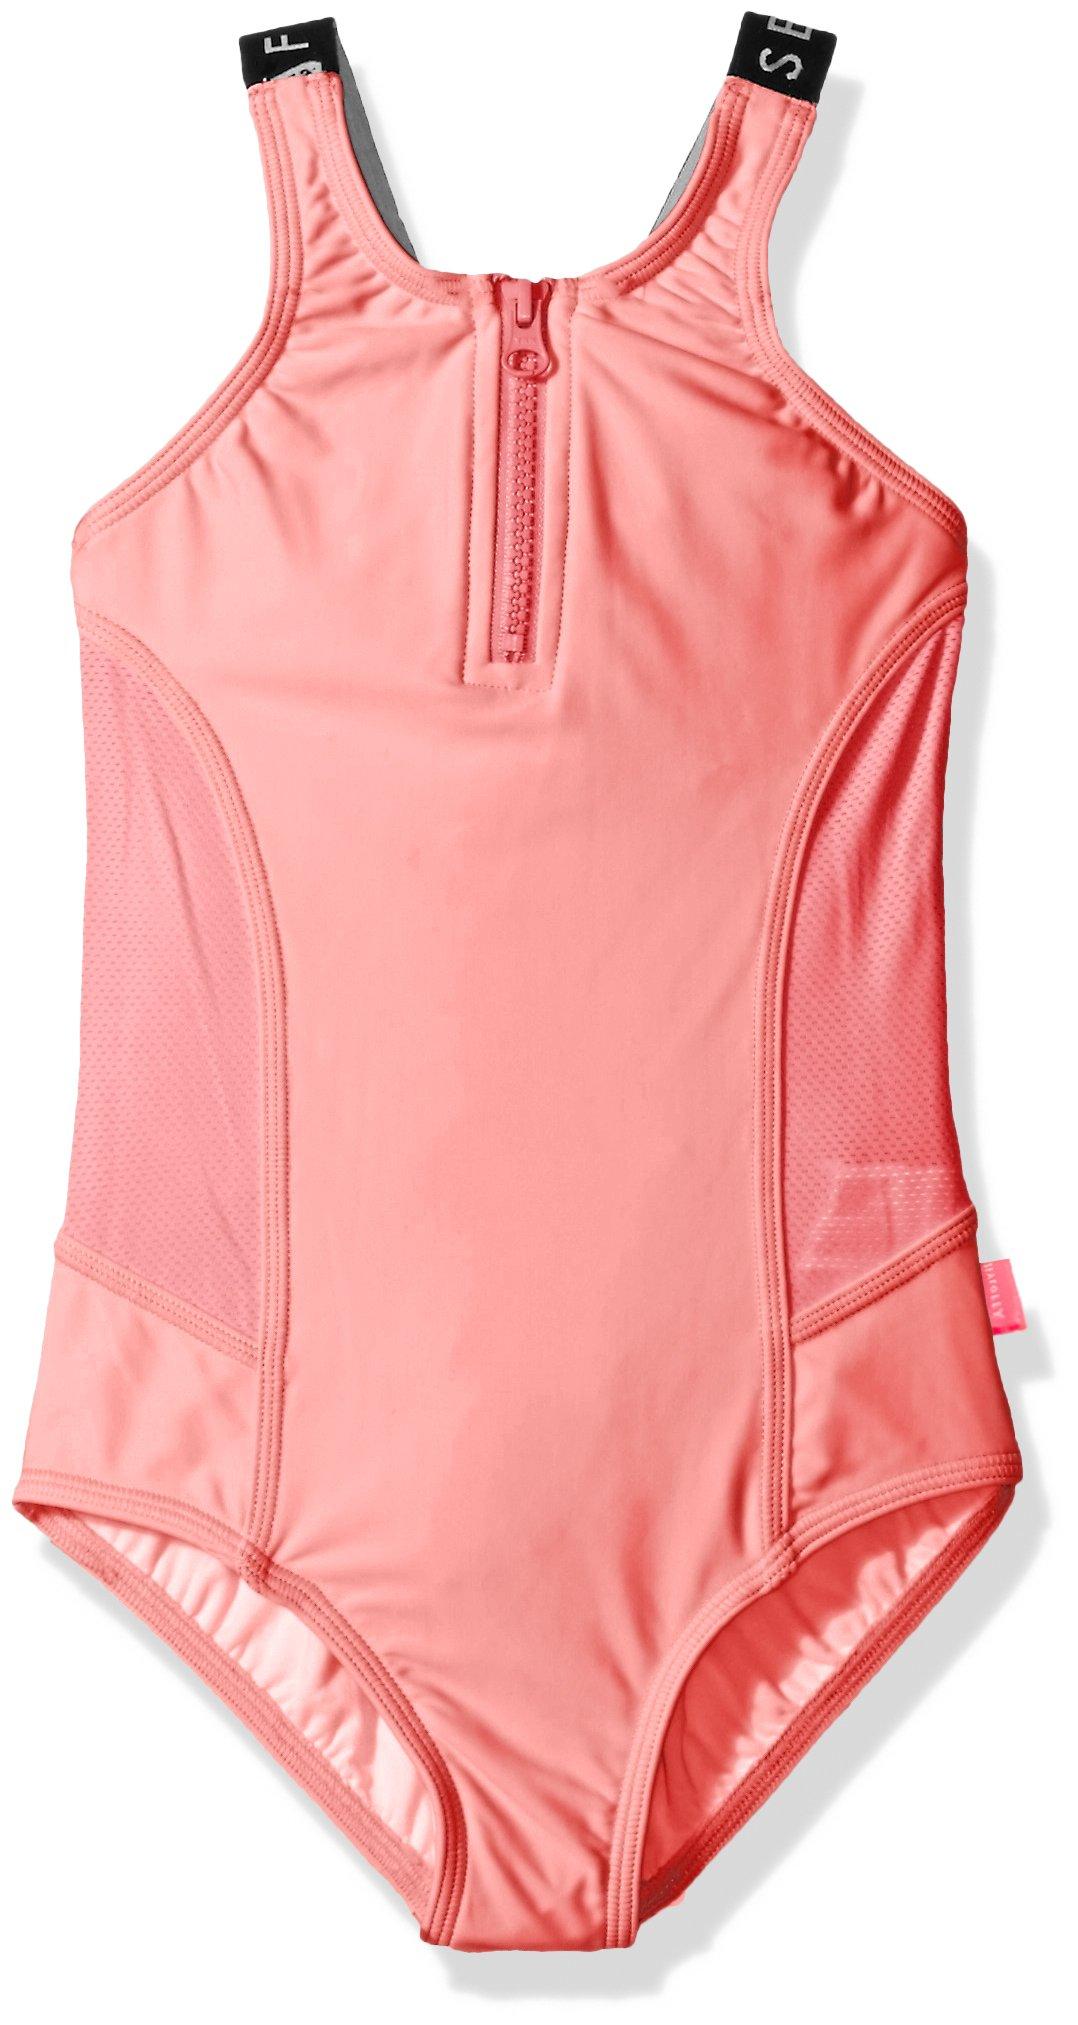 Seafolly Big Girls' Summer Essentials Tank, Coral Pink, 10